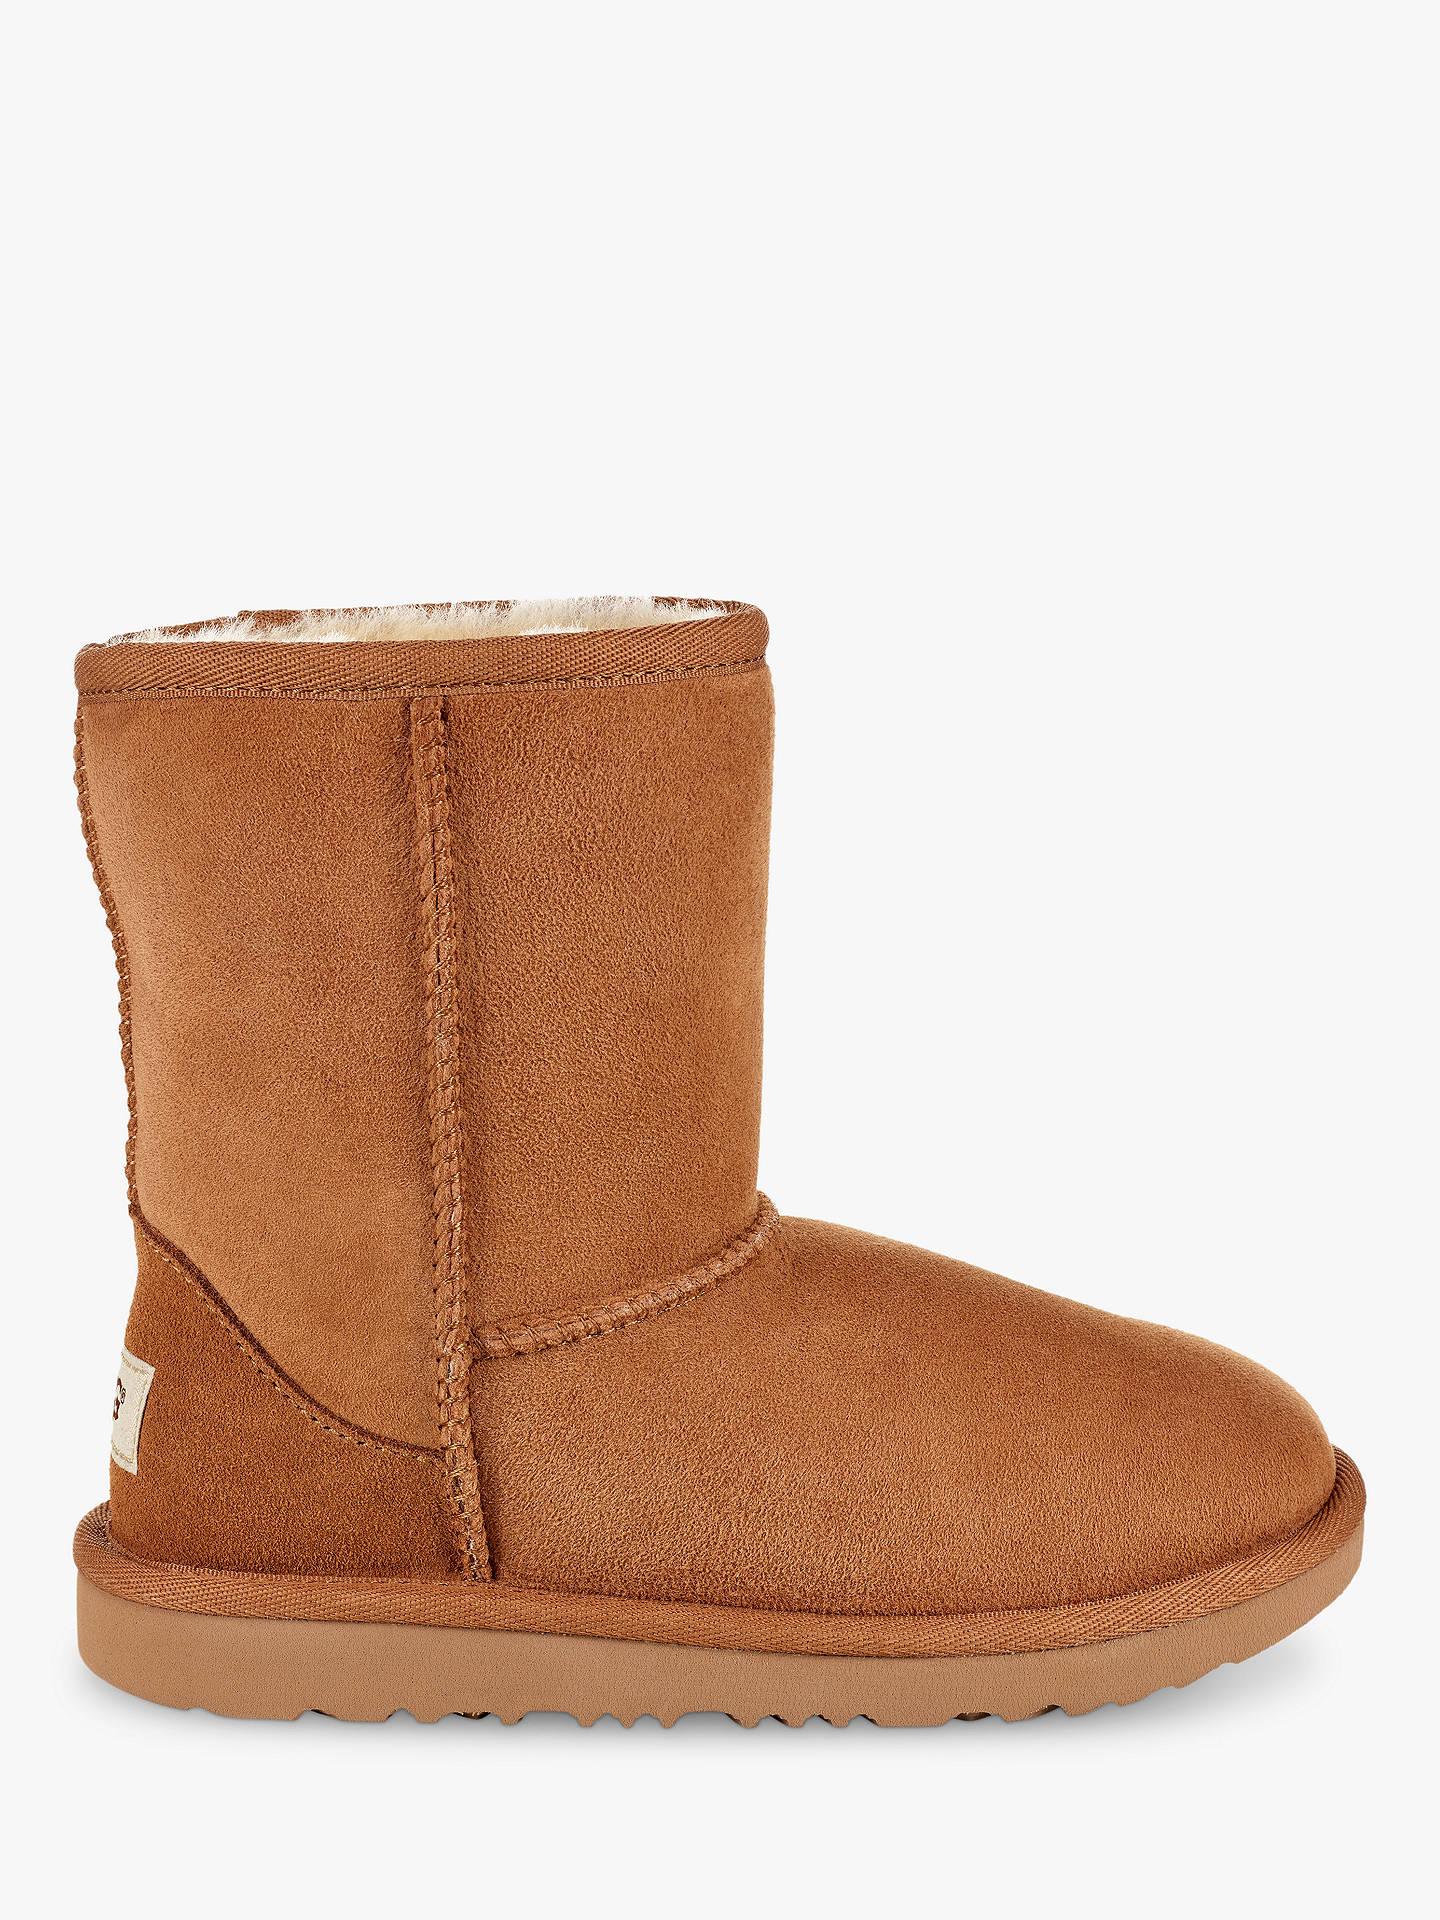 0dc9fadbee1 UGG Children's Classic Short II Sheepskin Boots, Chestnut